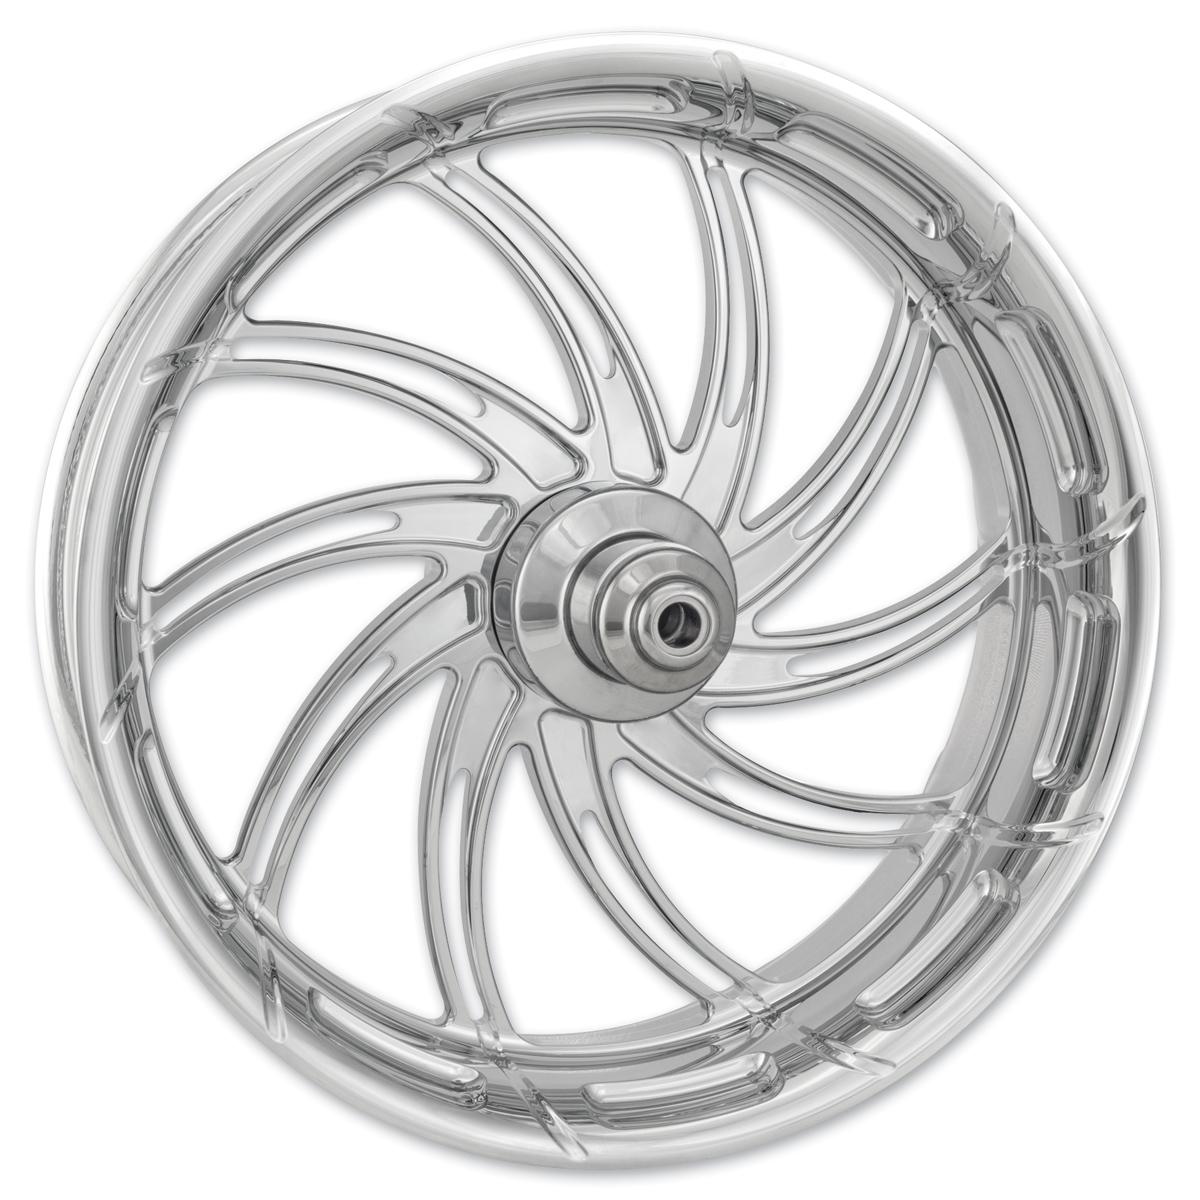 Performance Machine Supra Chrome Rear Wheel 18x5.5 Non-ABS